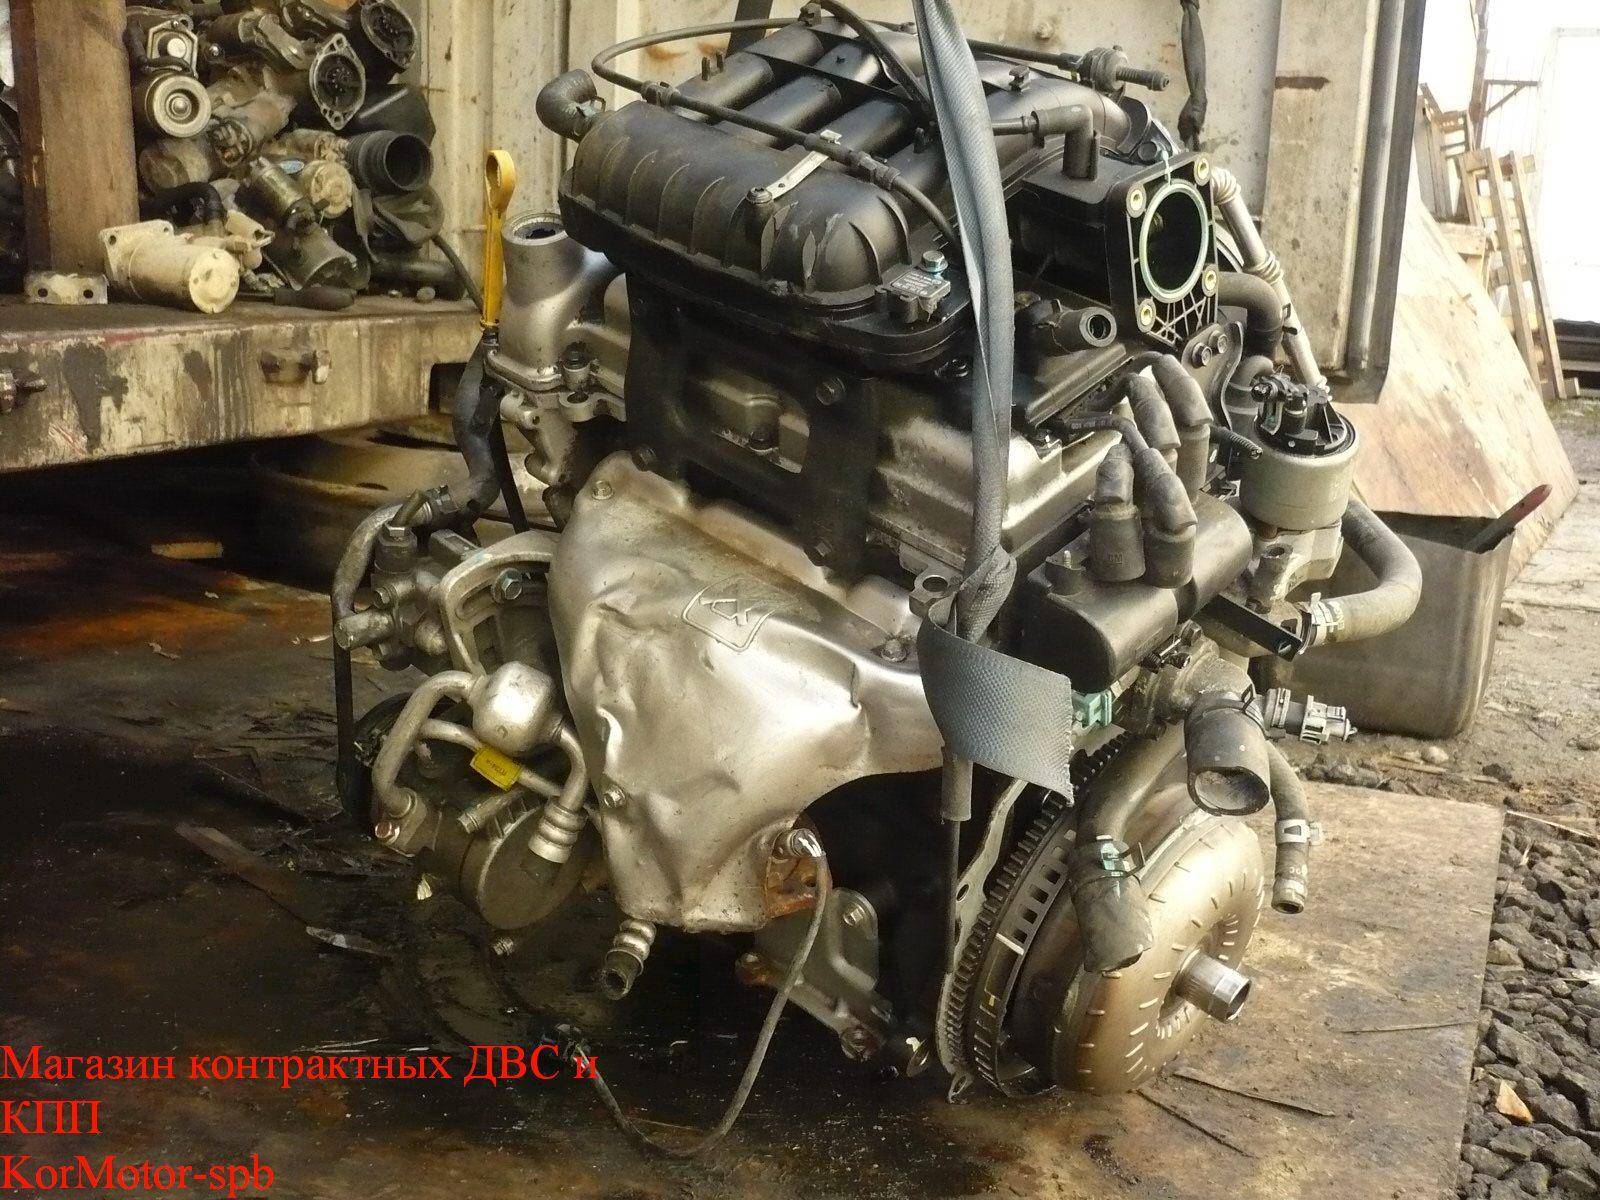 Двигатель B10D1 Шевроле Спарк ( Chevrolet Spark ) 1.0 68 л.с M300 2010-2015 S-TECH II 16v 96474056, 2519477,25189207